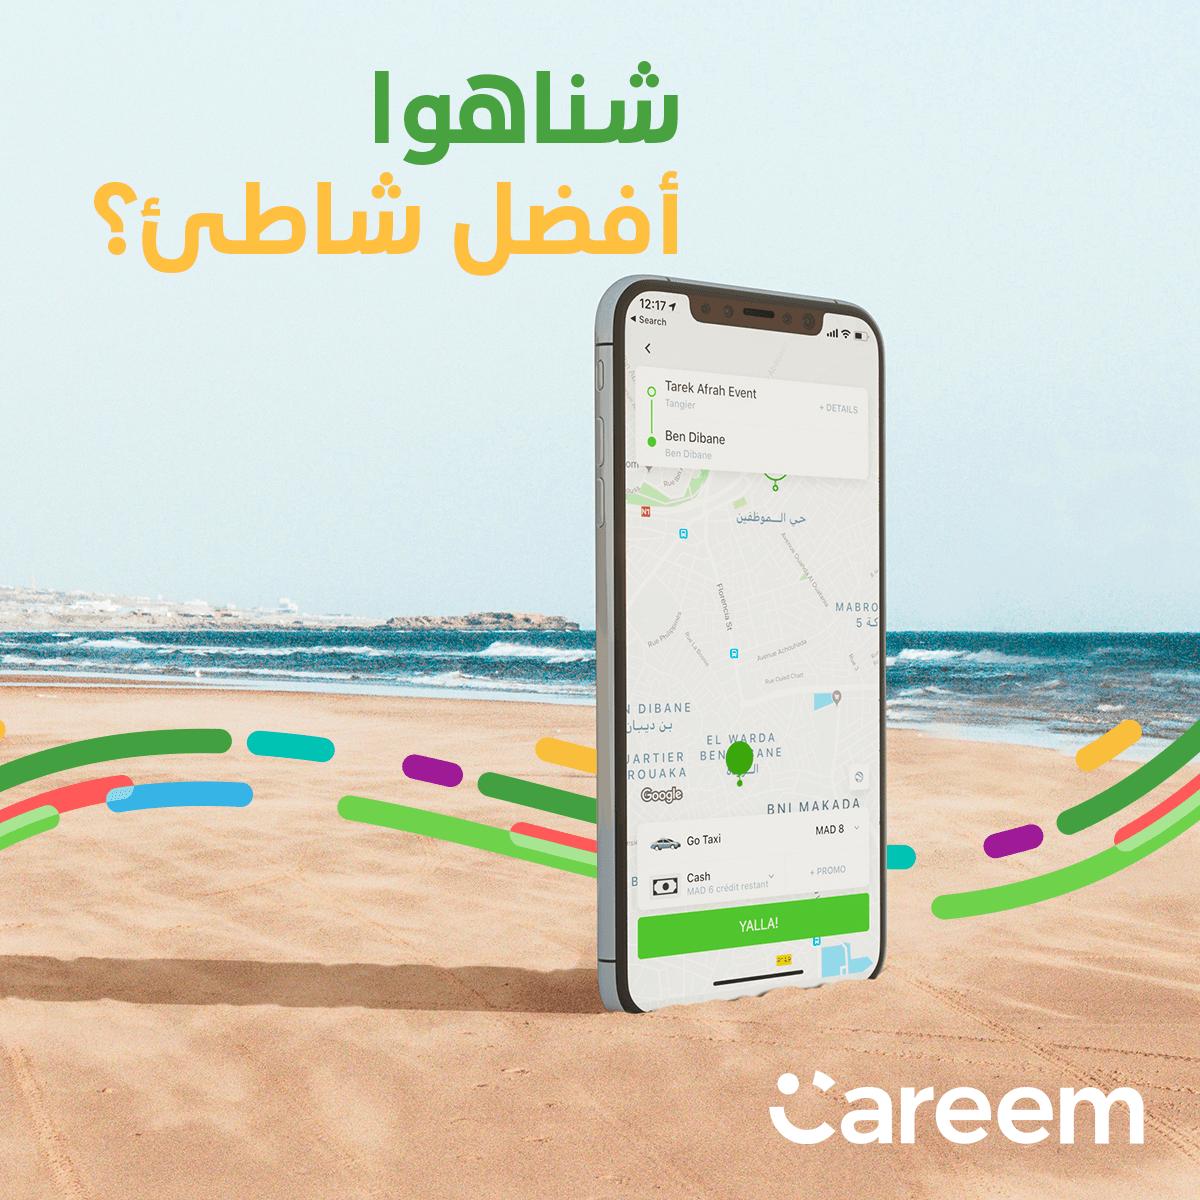 Careem-17